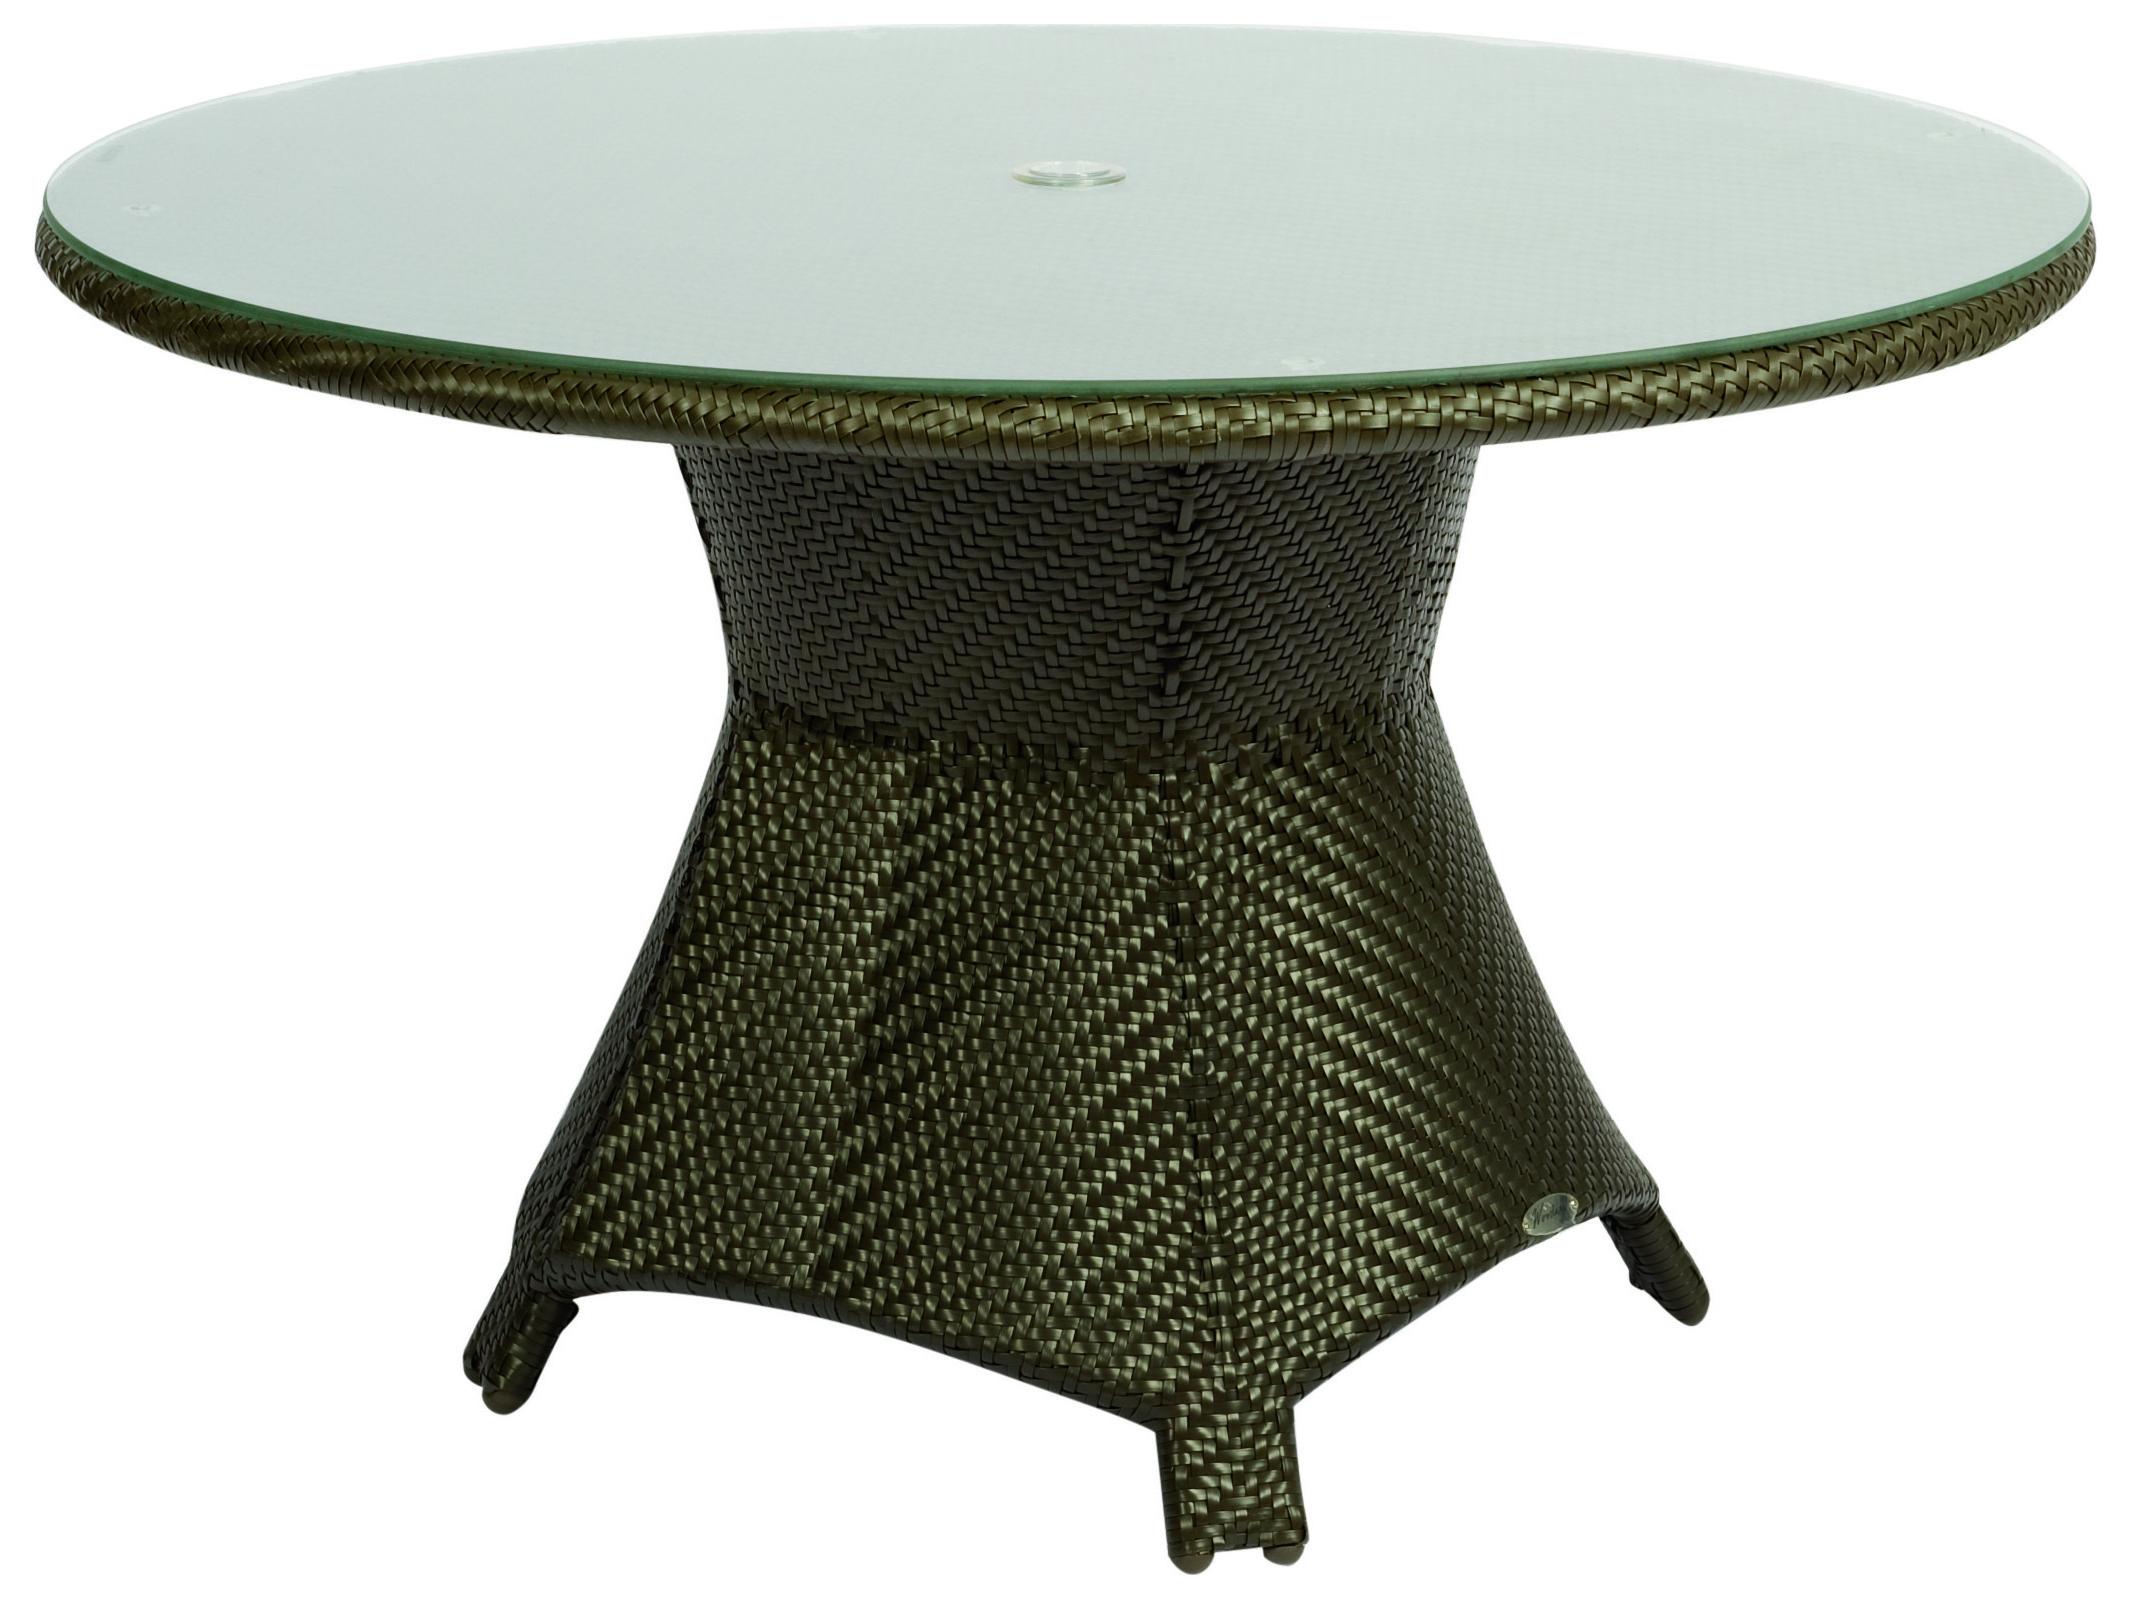 Woodard Trinidad Wicker 48 Wide Round Glass Top Dining Table With Umbrella Hole Wr6u0165j